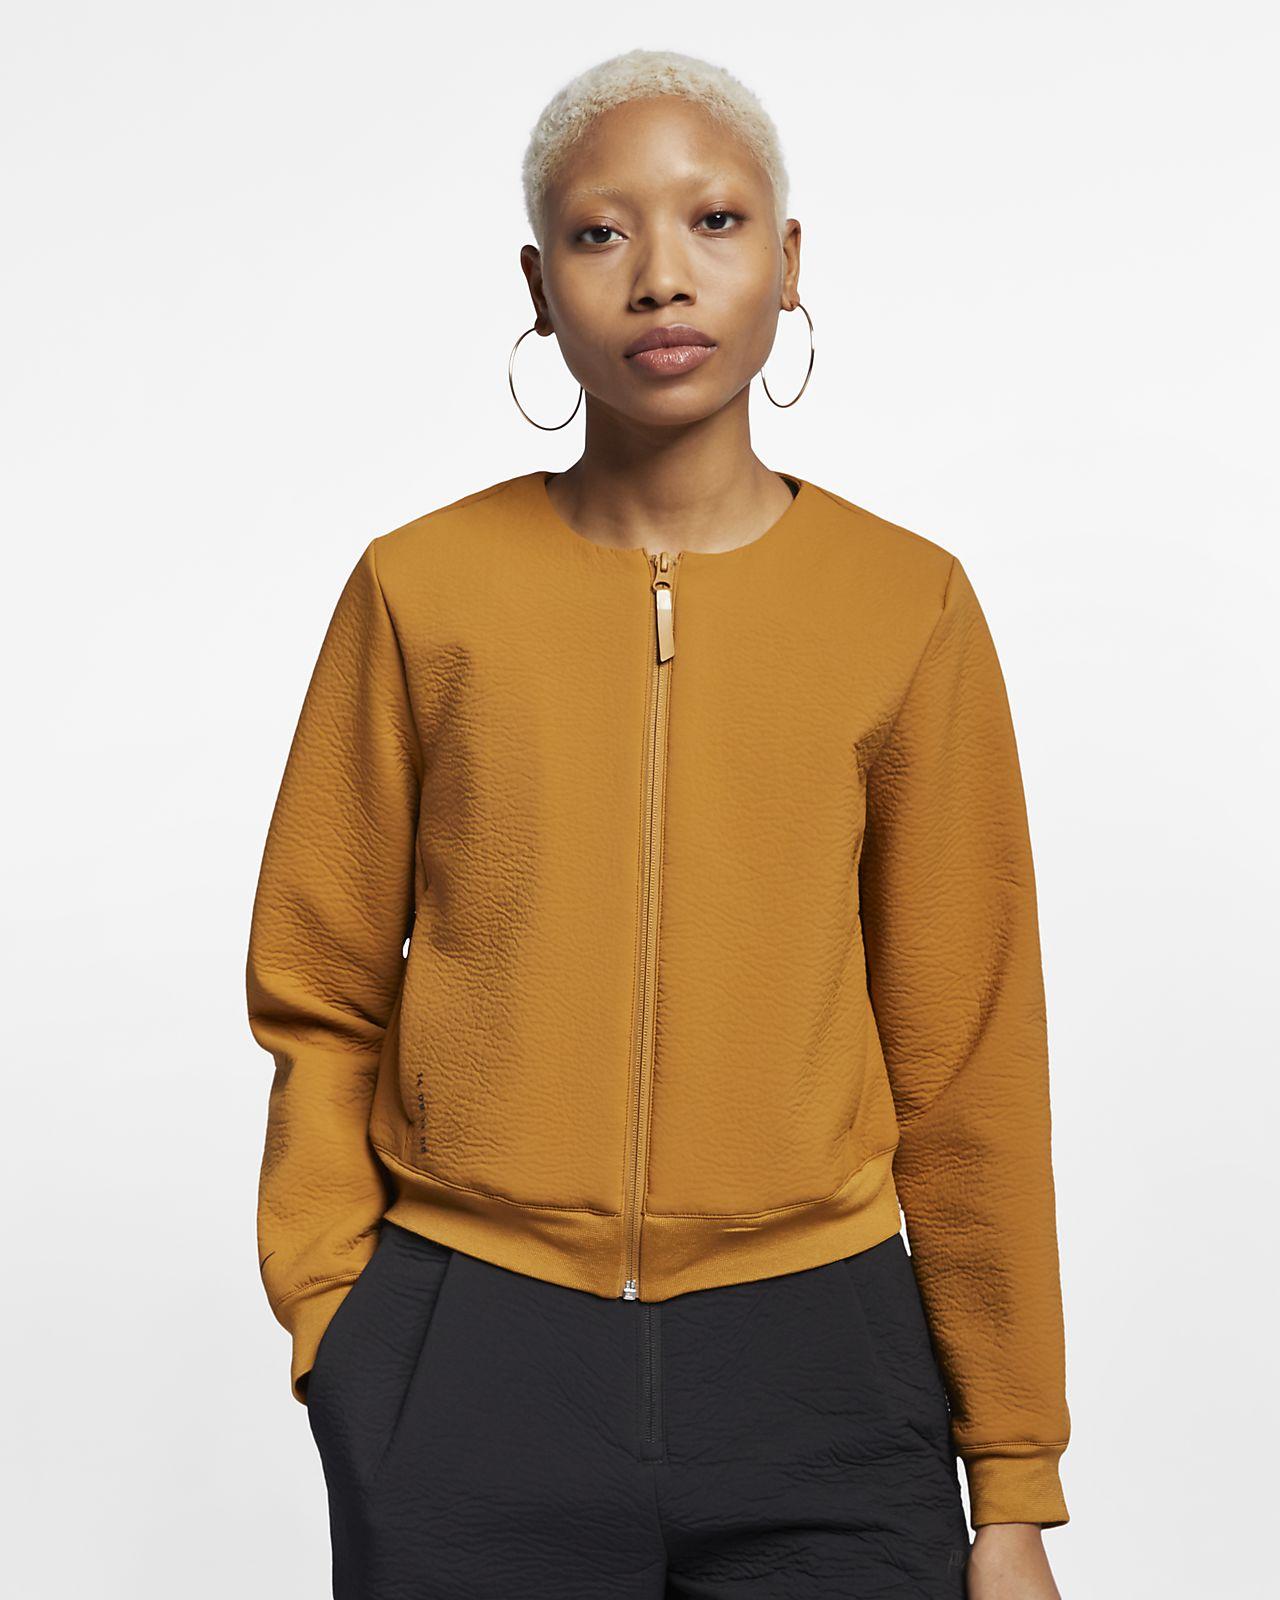 detailed look bece7 777fb veste-entierement-zippee-sportswear-tech-pack-pour-sdZvtG.jpg